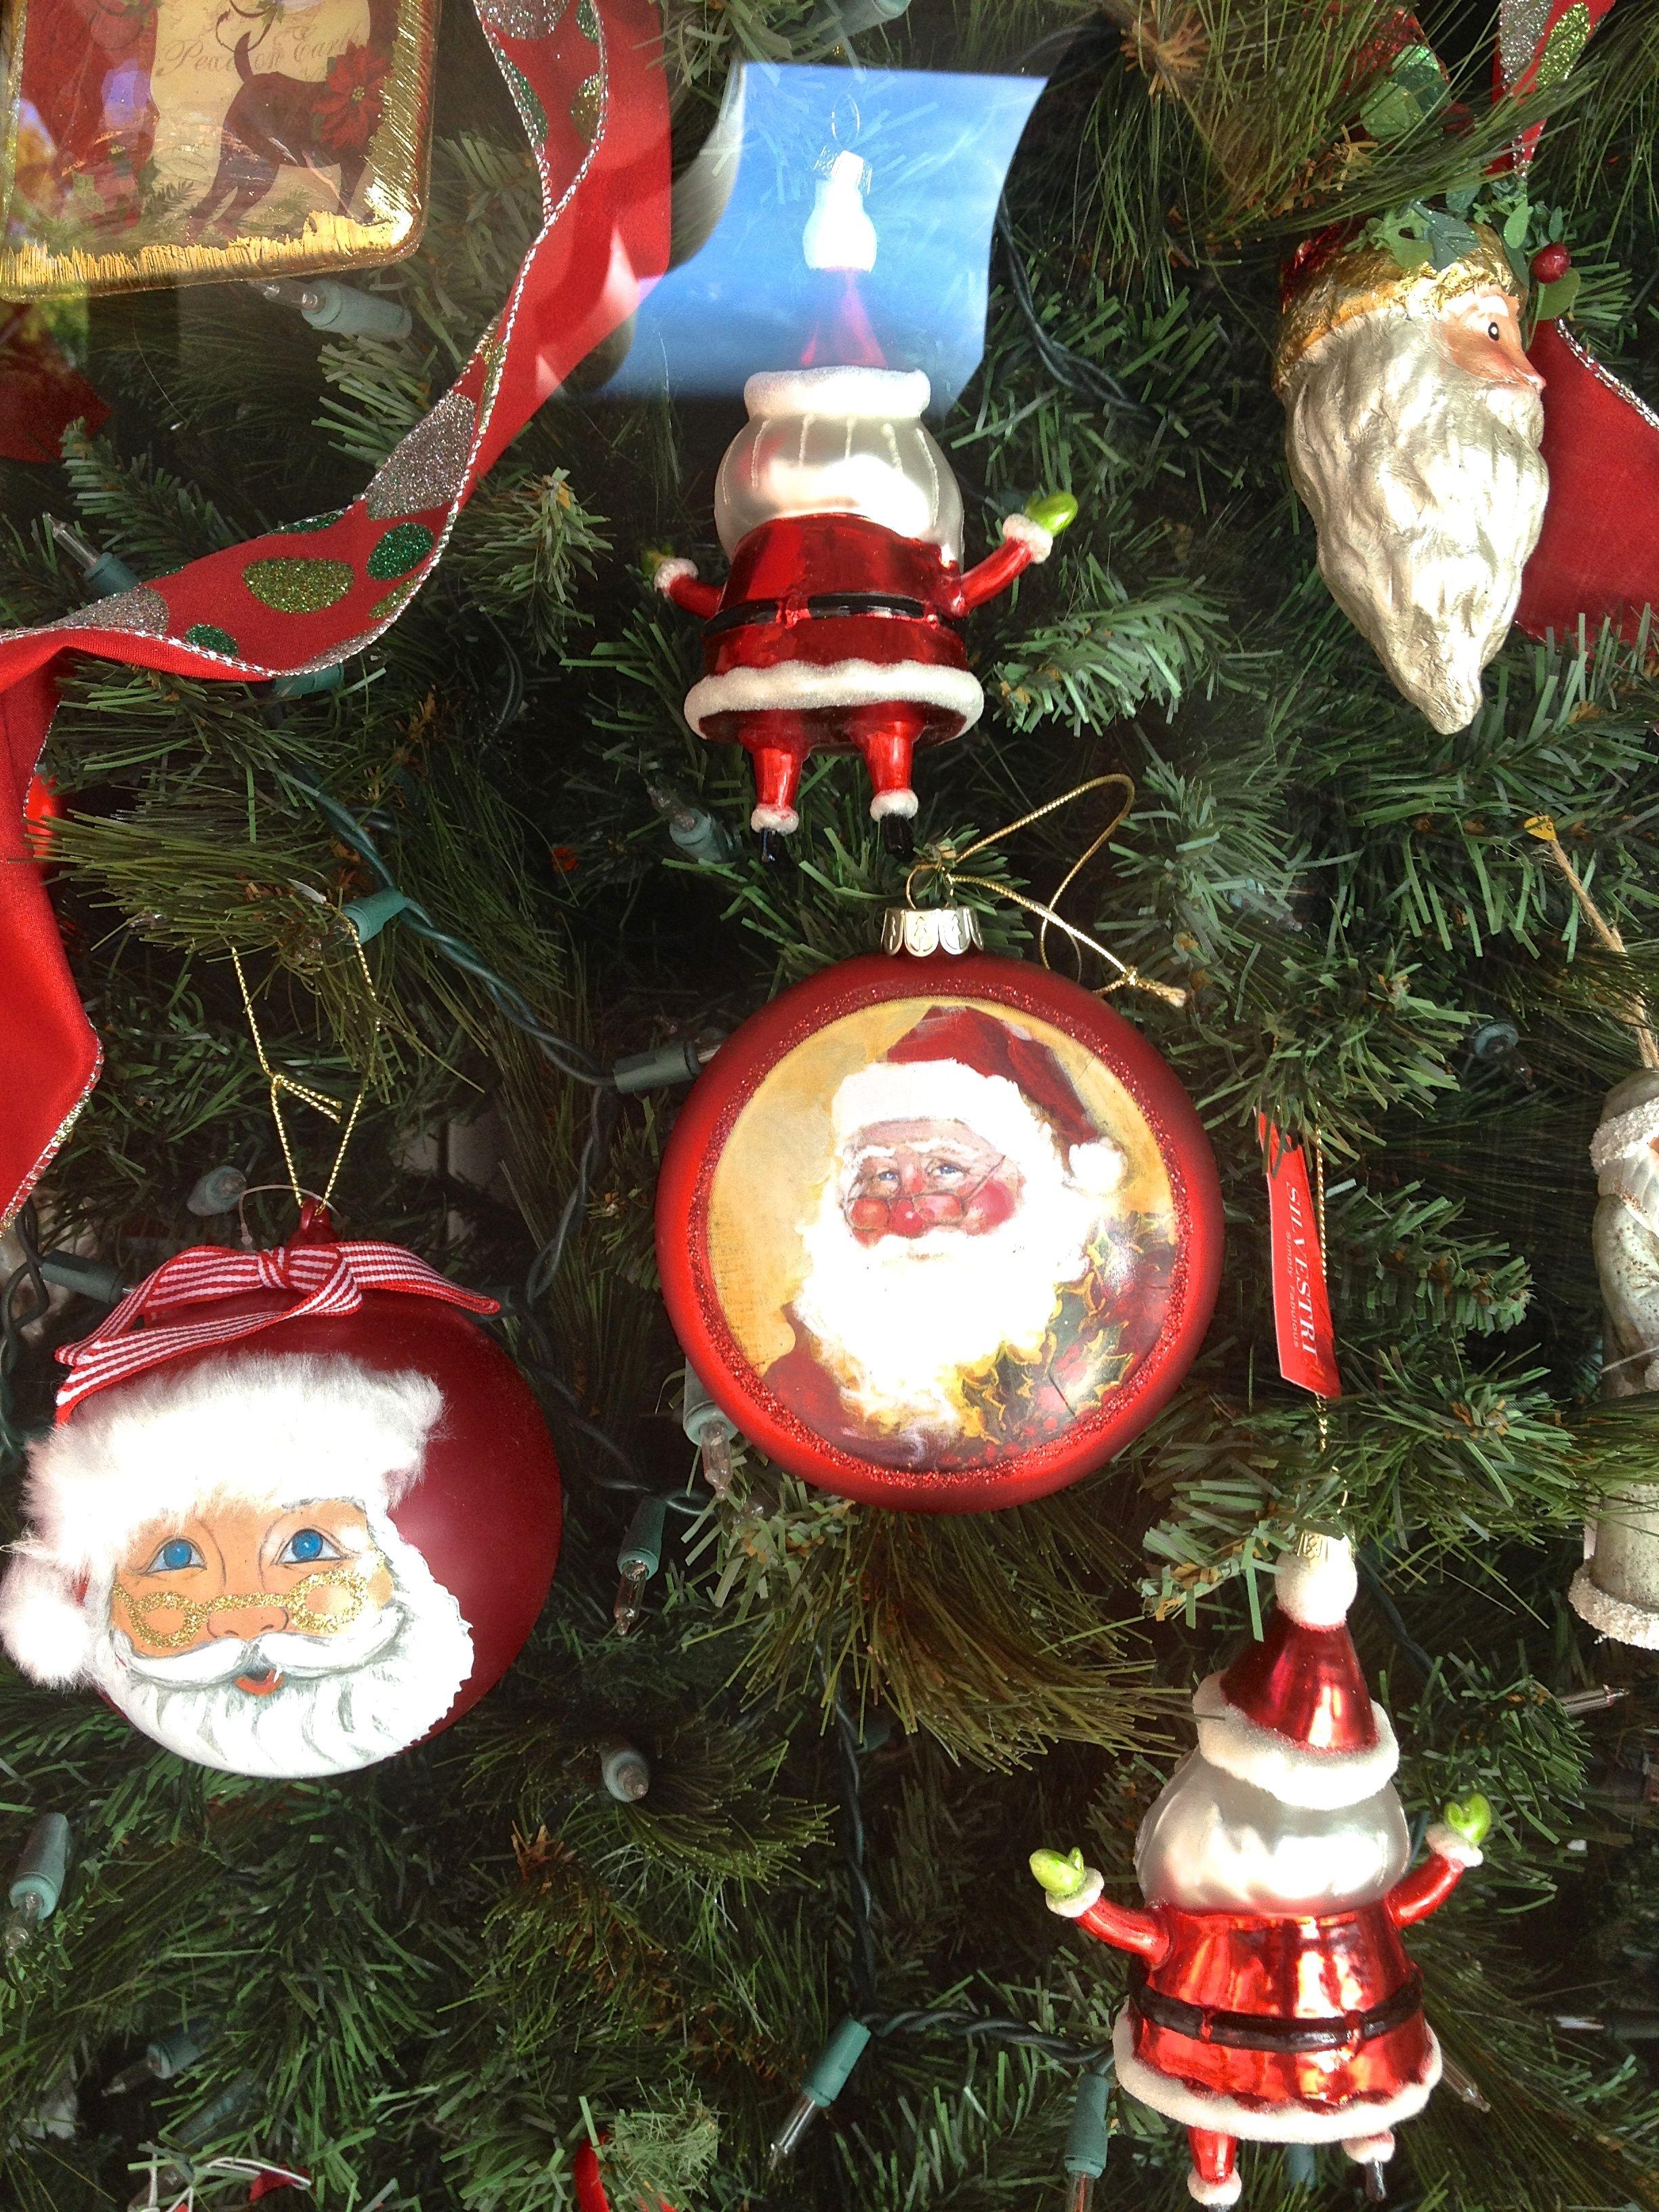 Christmas-tree-ornaments-santa-memento-gift-shop-palm-springs ...